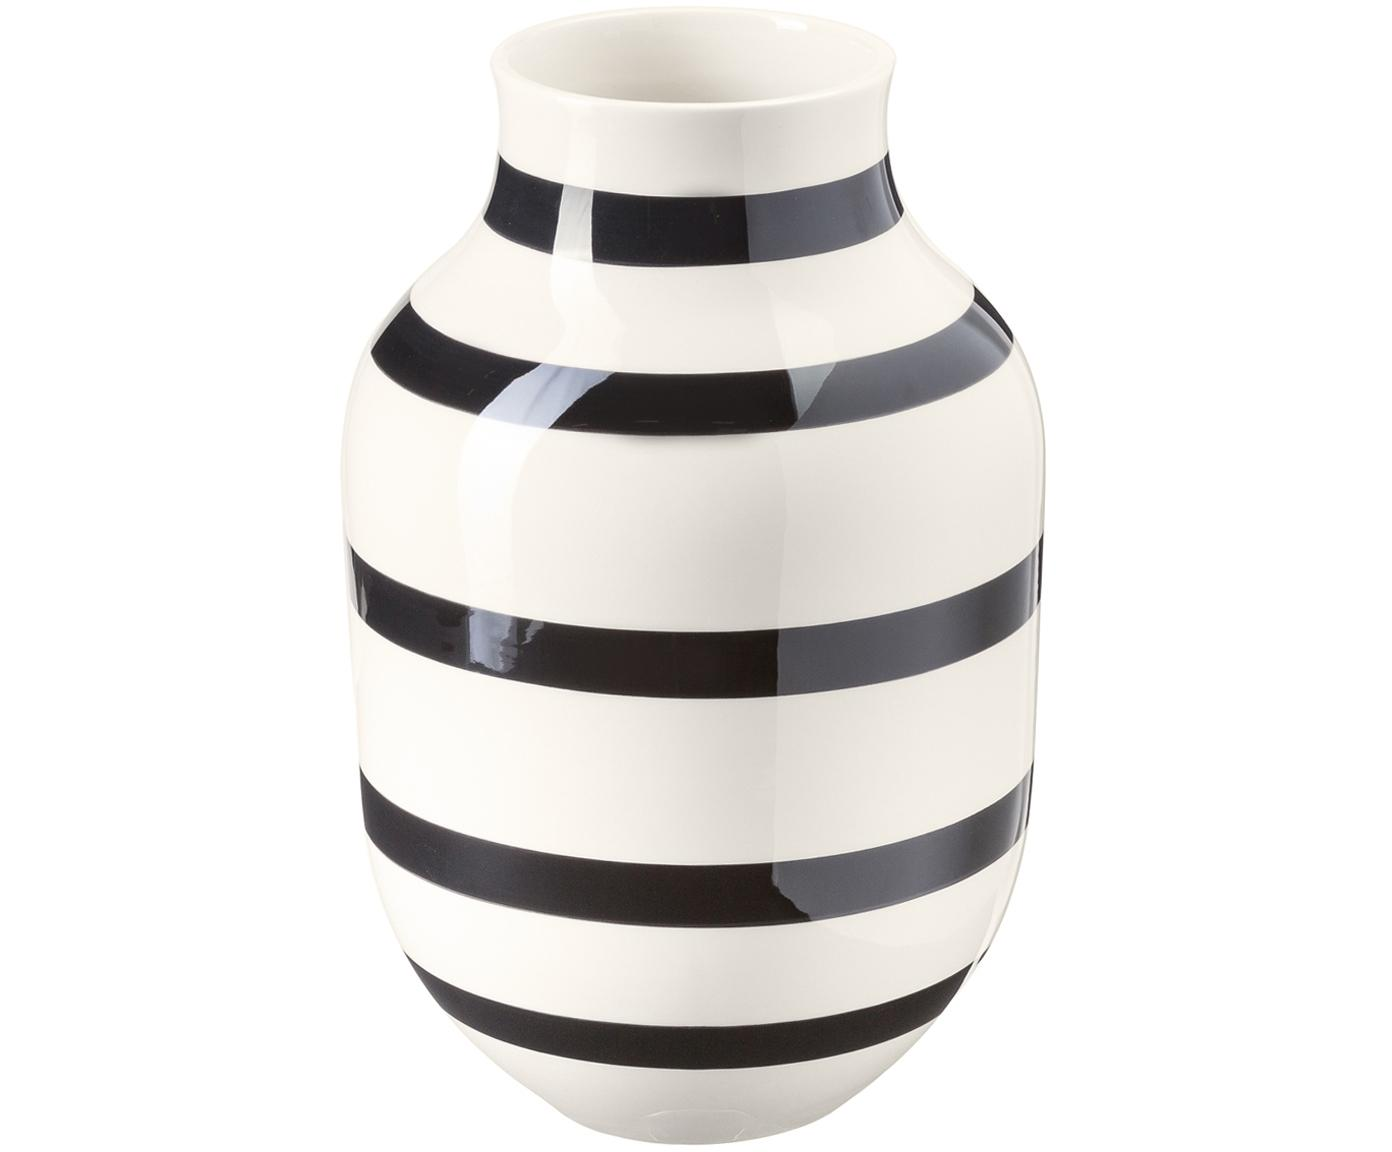 Handgemaakte design vaas Omaggio, groot, Keramiek, Zwart, wit, Ø 20 x H 31 cm